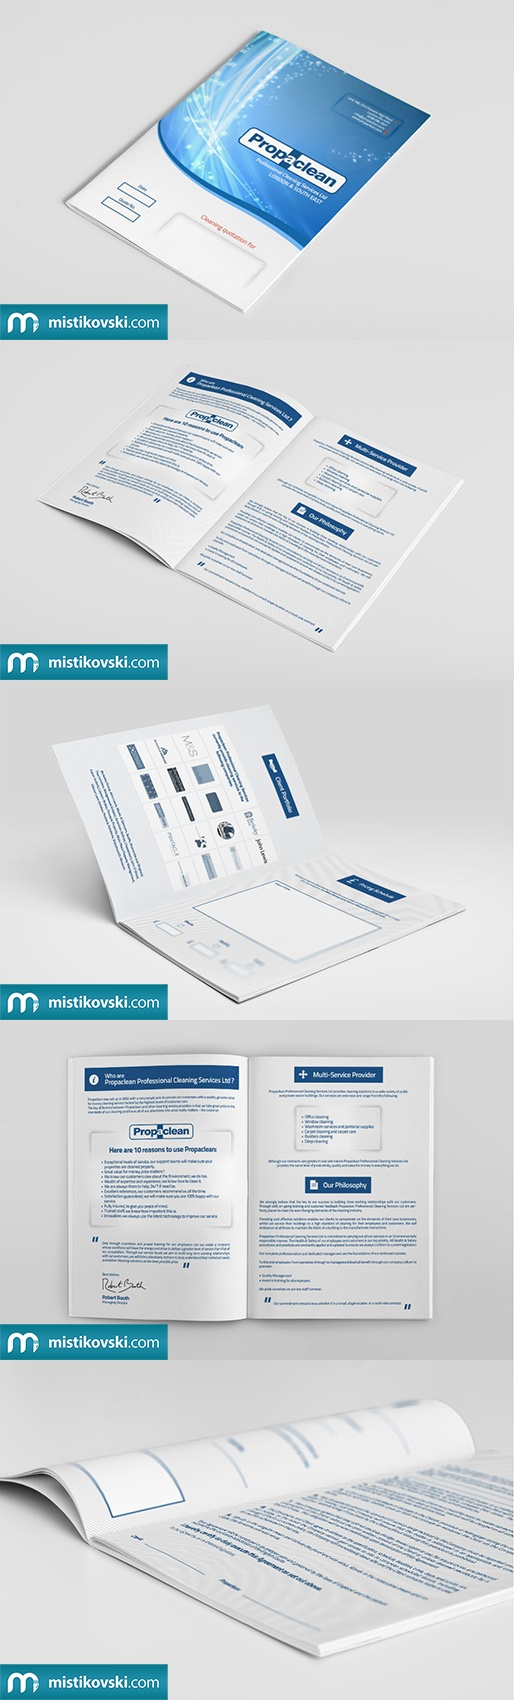 Propaclean   PDF Quote Form   www.mistikovski.com